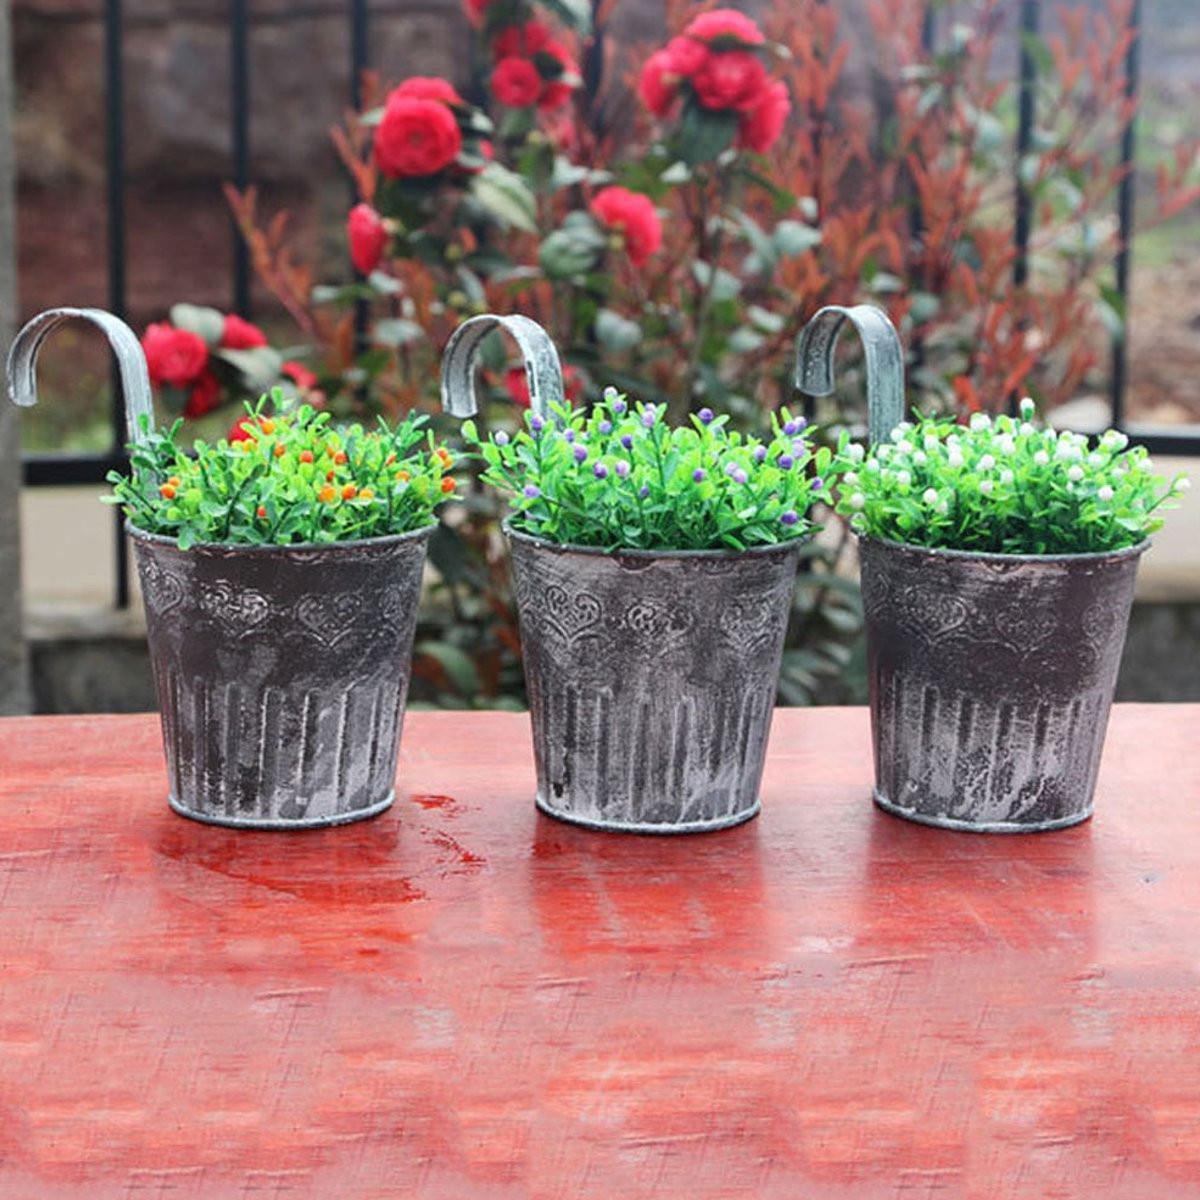 Small Crop Of Balcony Garden Planters